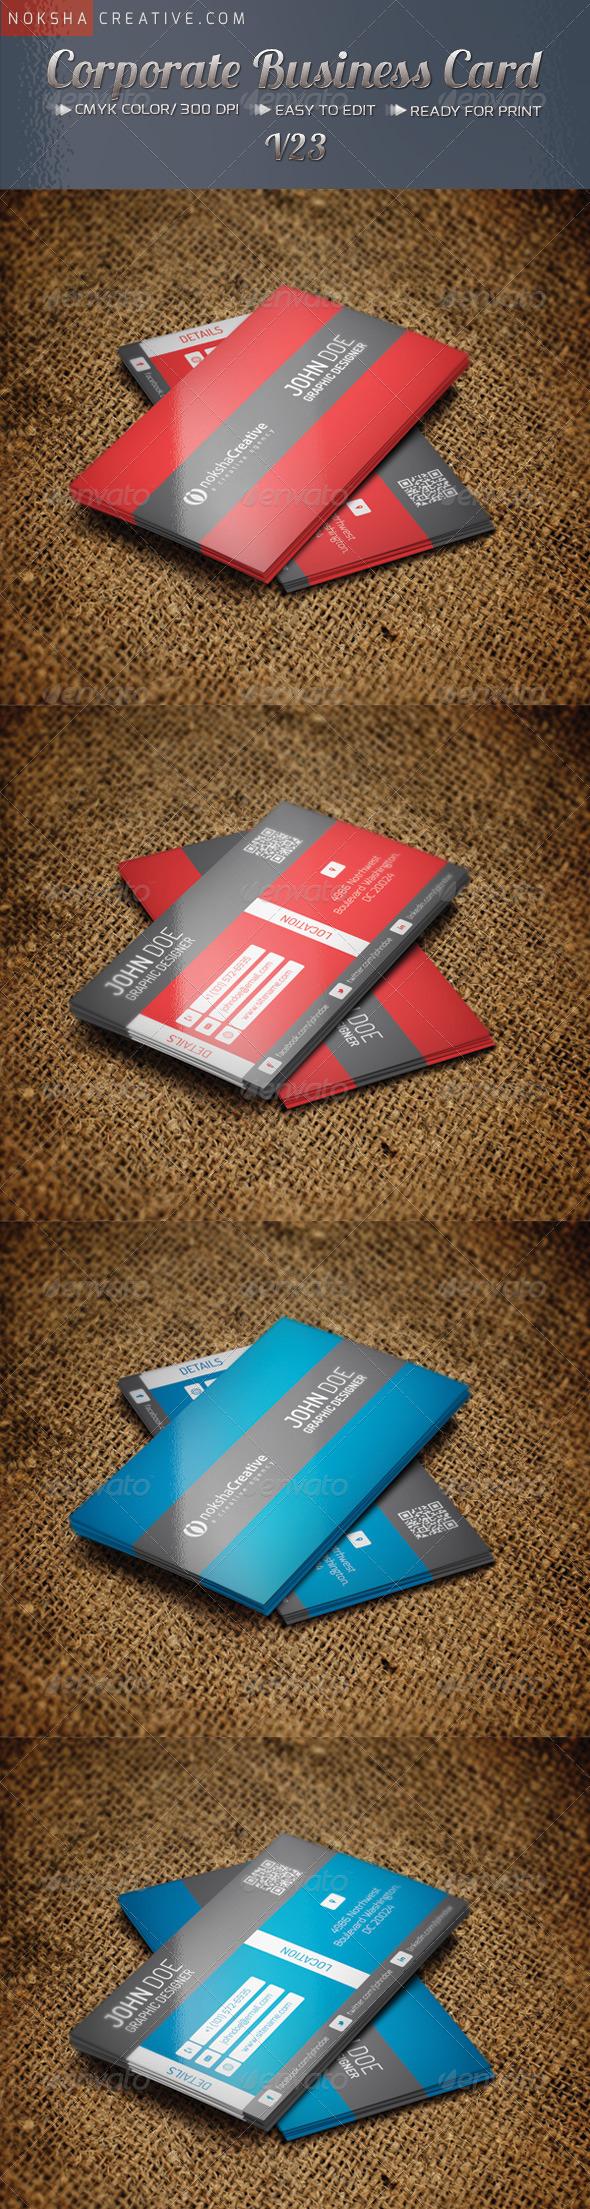 Corporate Business Card v-23 - Corporate Business Cards